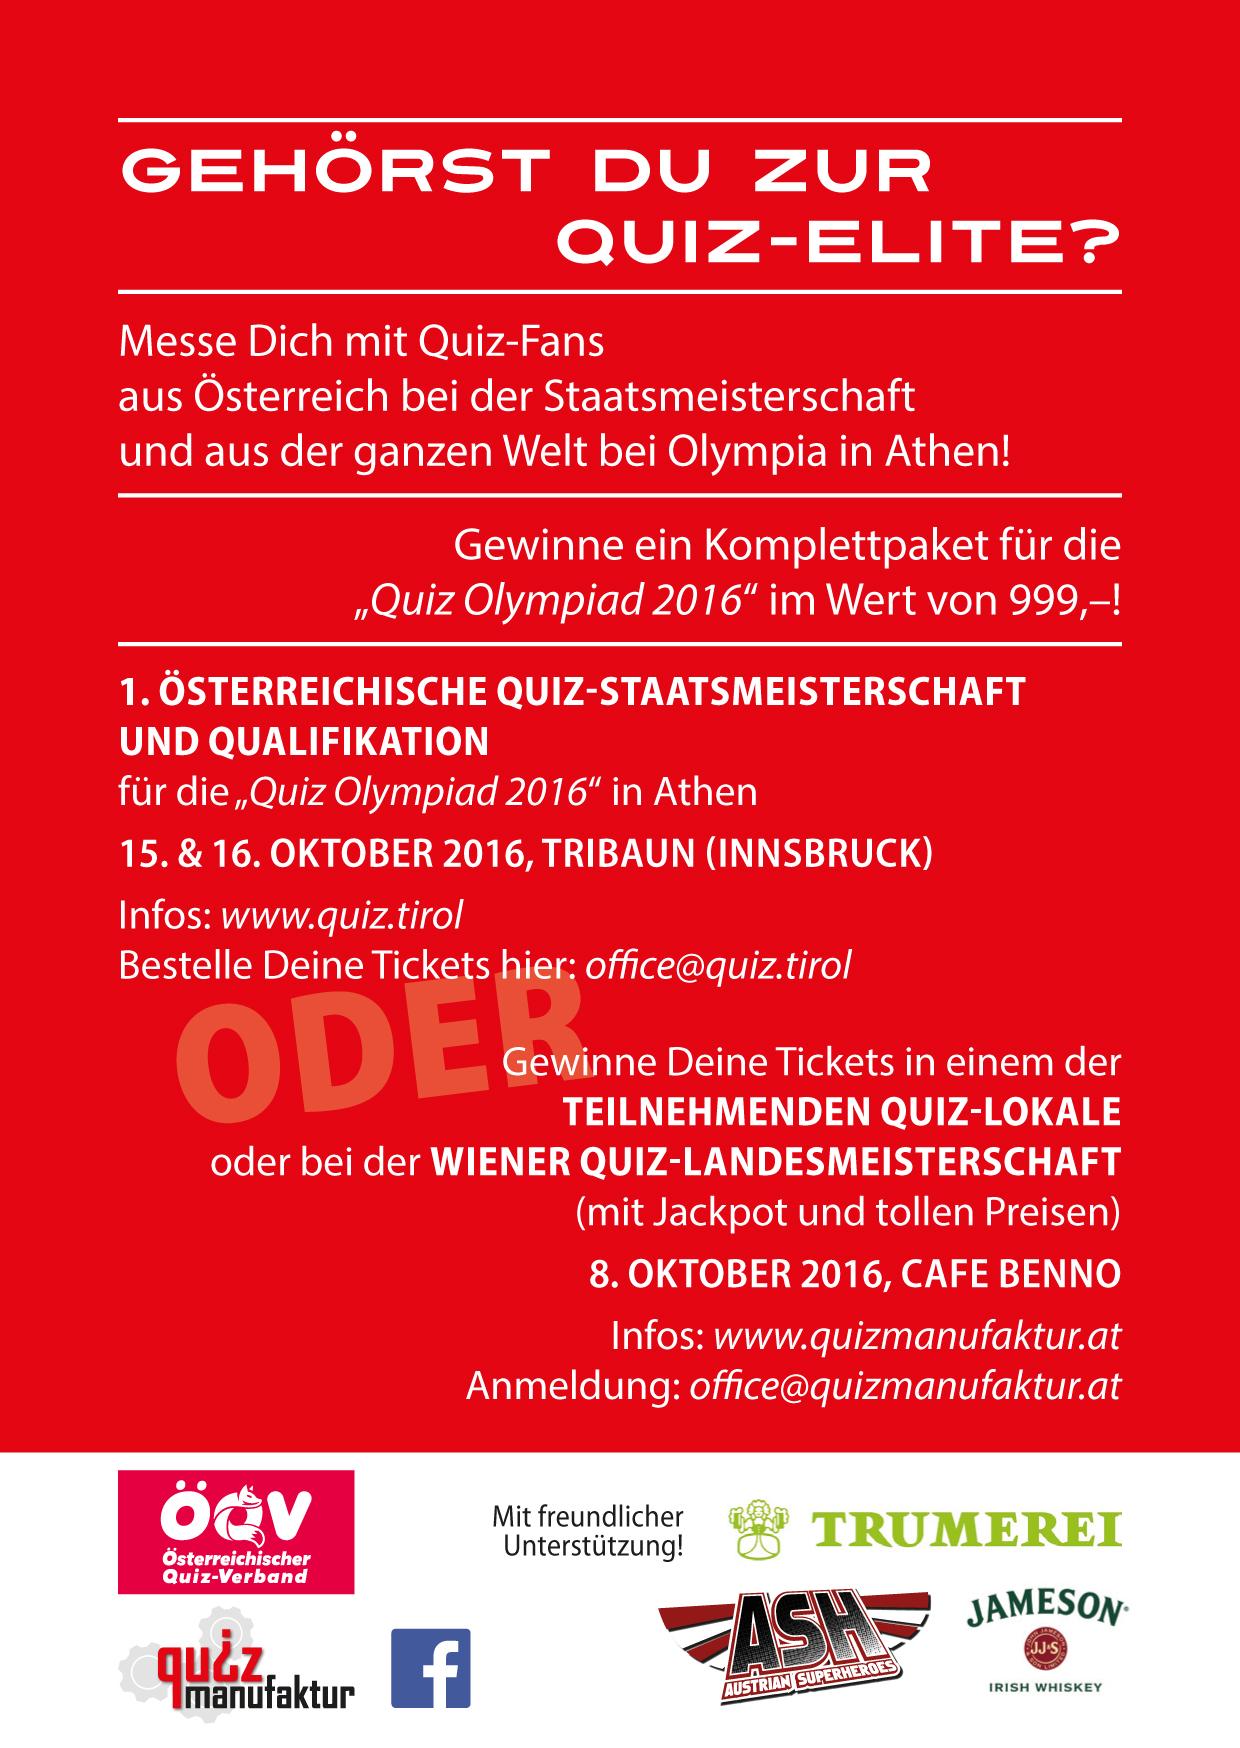 quiz_olympia_wien-004-2